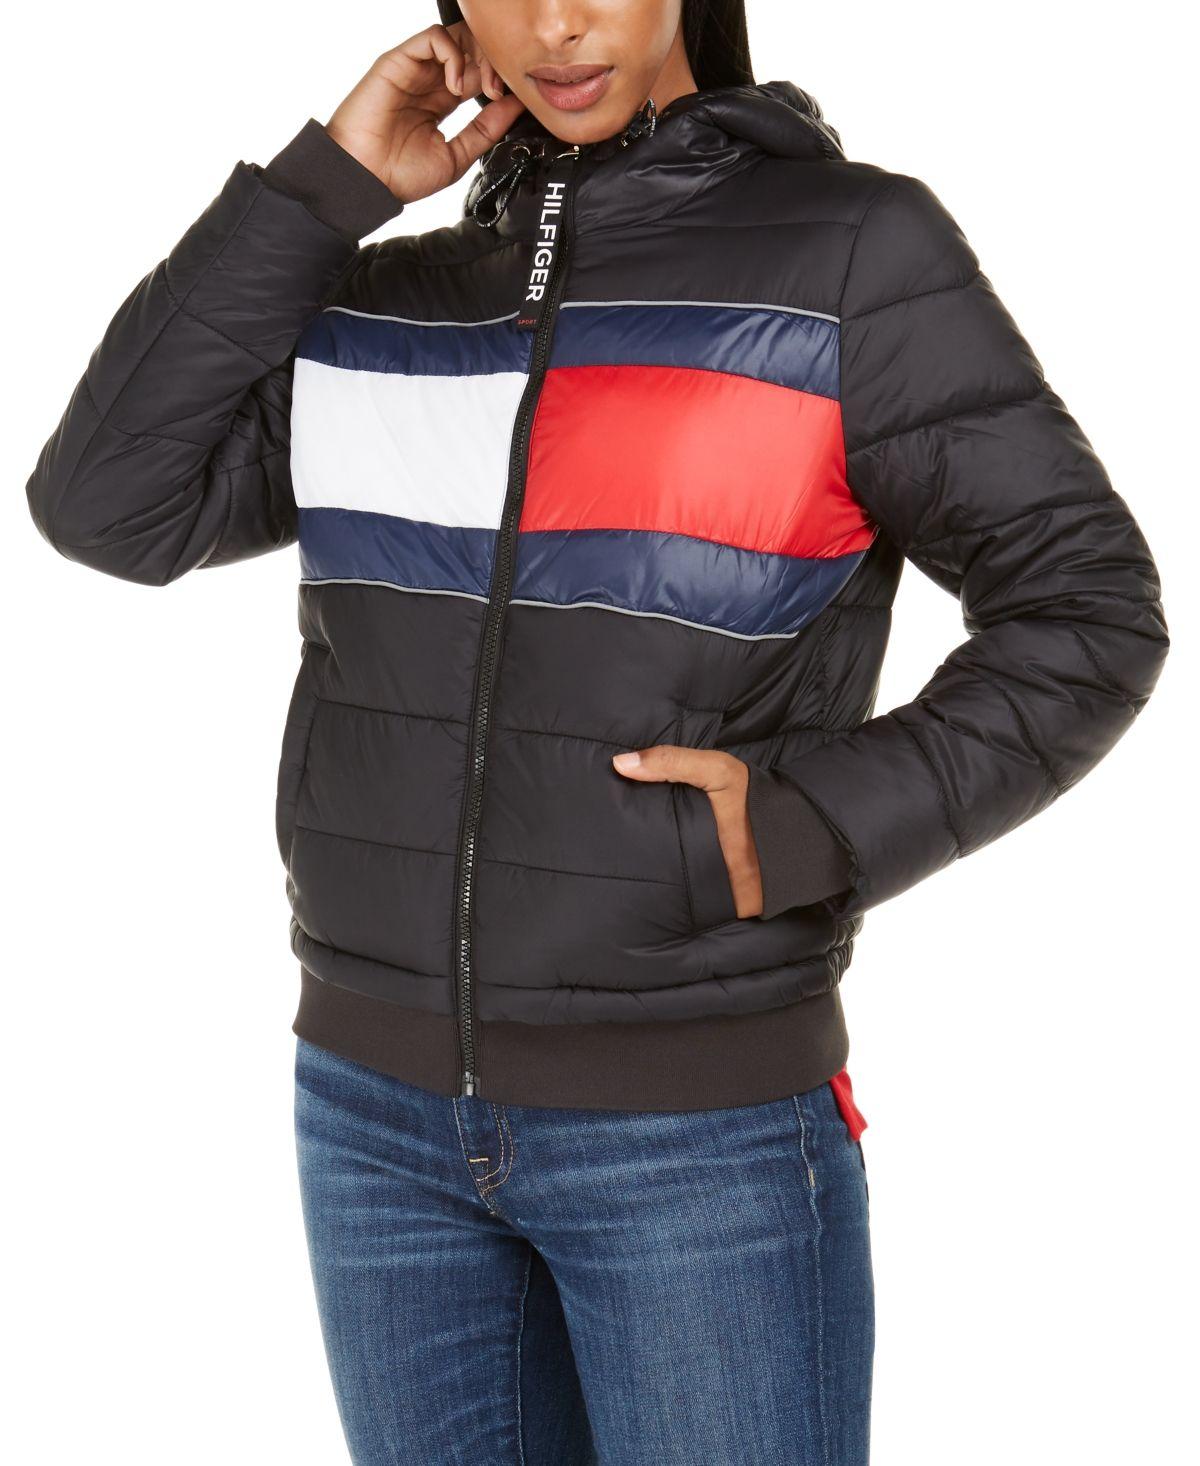 Tommy Hilfiger Sport Quilted Colorblocked Jacket Black Blazer Jackets For Women Tommy Hilfiger Tommy Hilfiger Jackets [ 1466 x 1200 Pixel ]